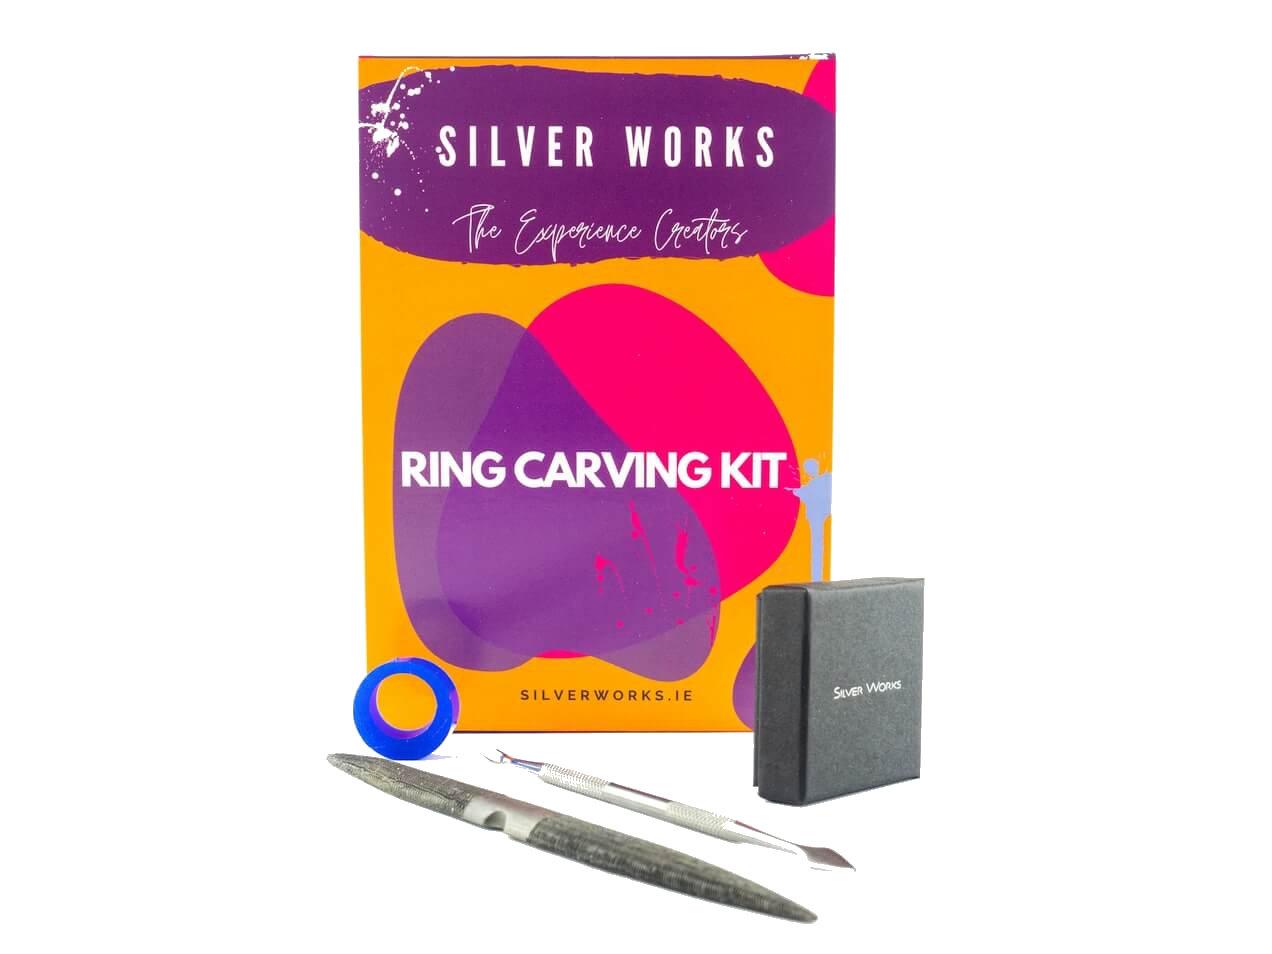 Silverworks - Ring Carving Kit